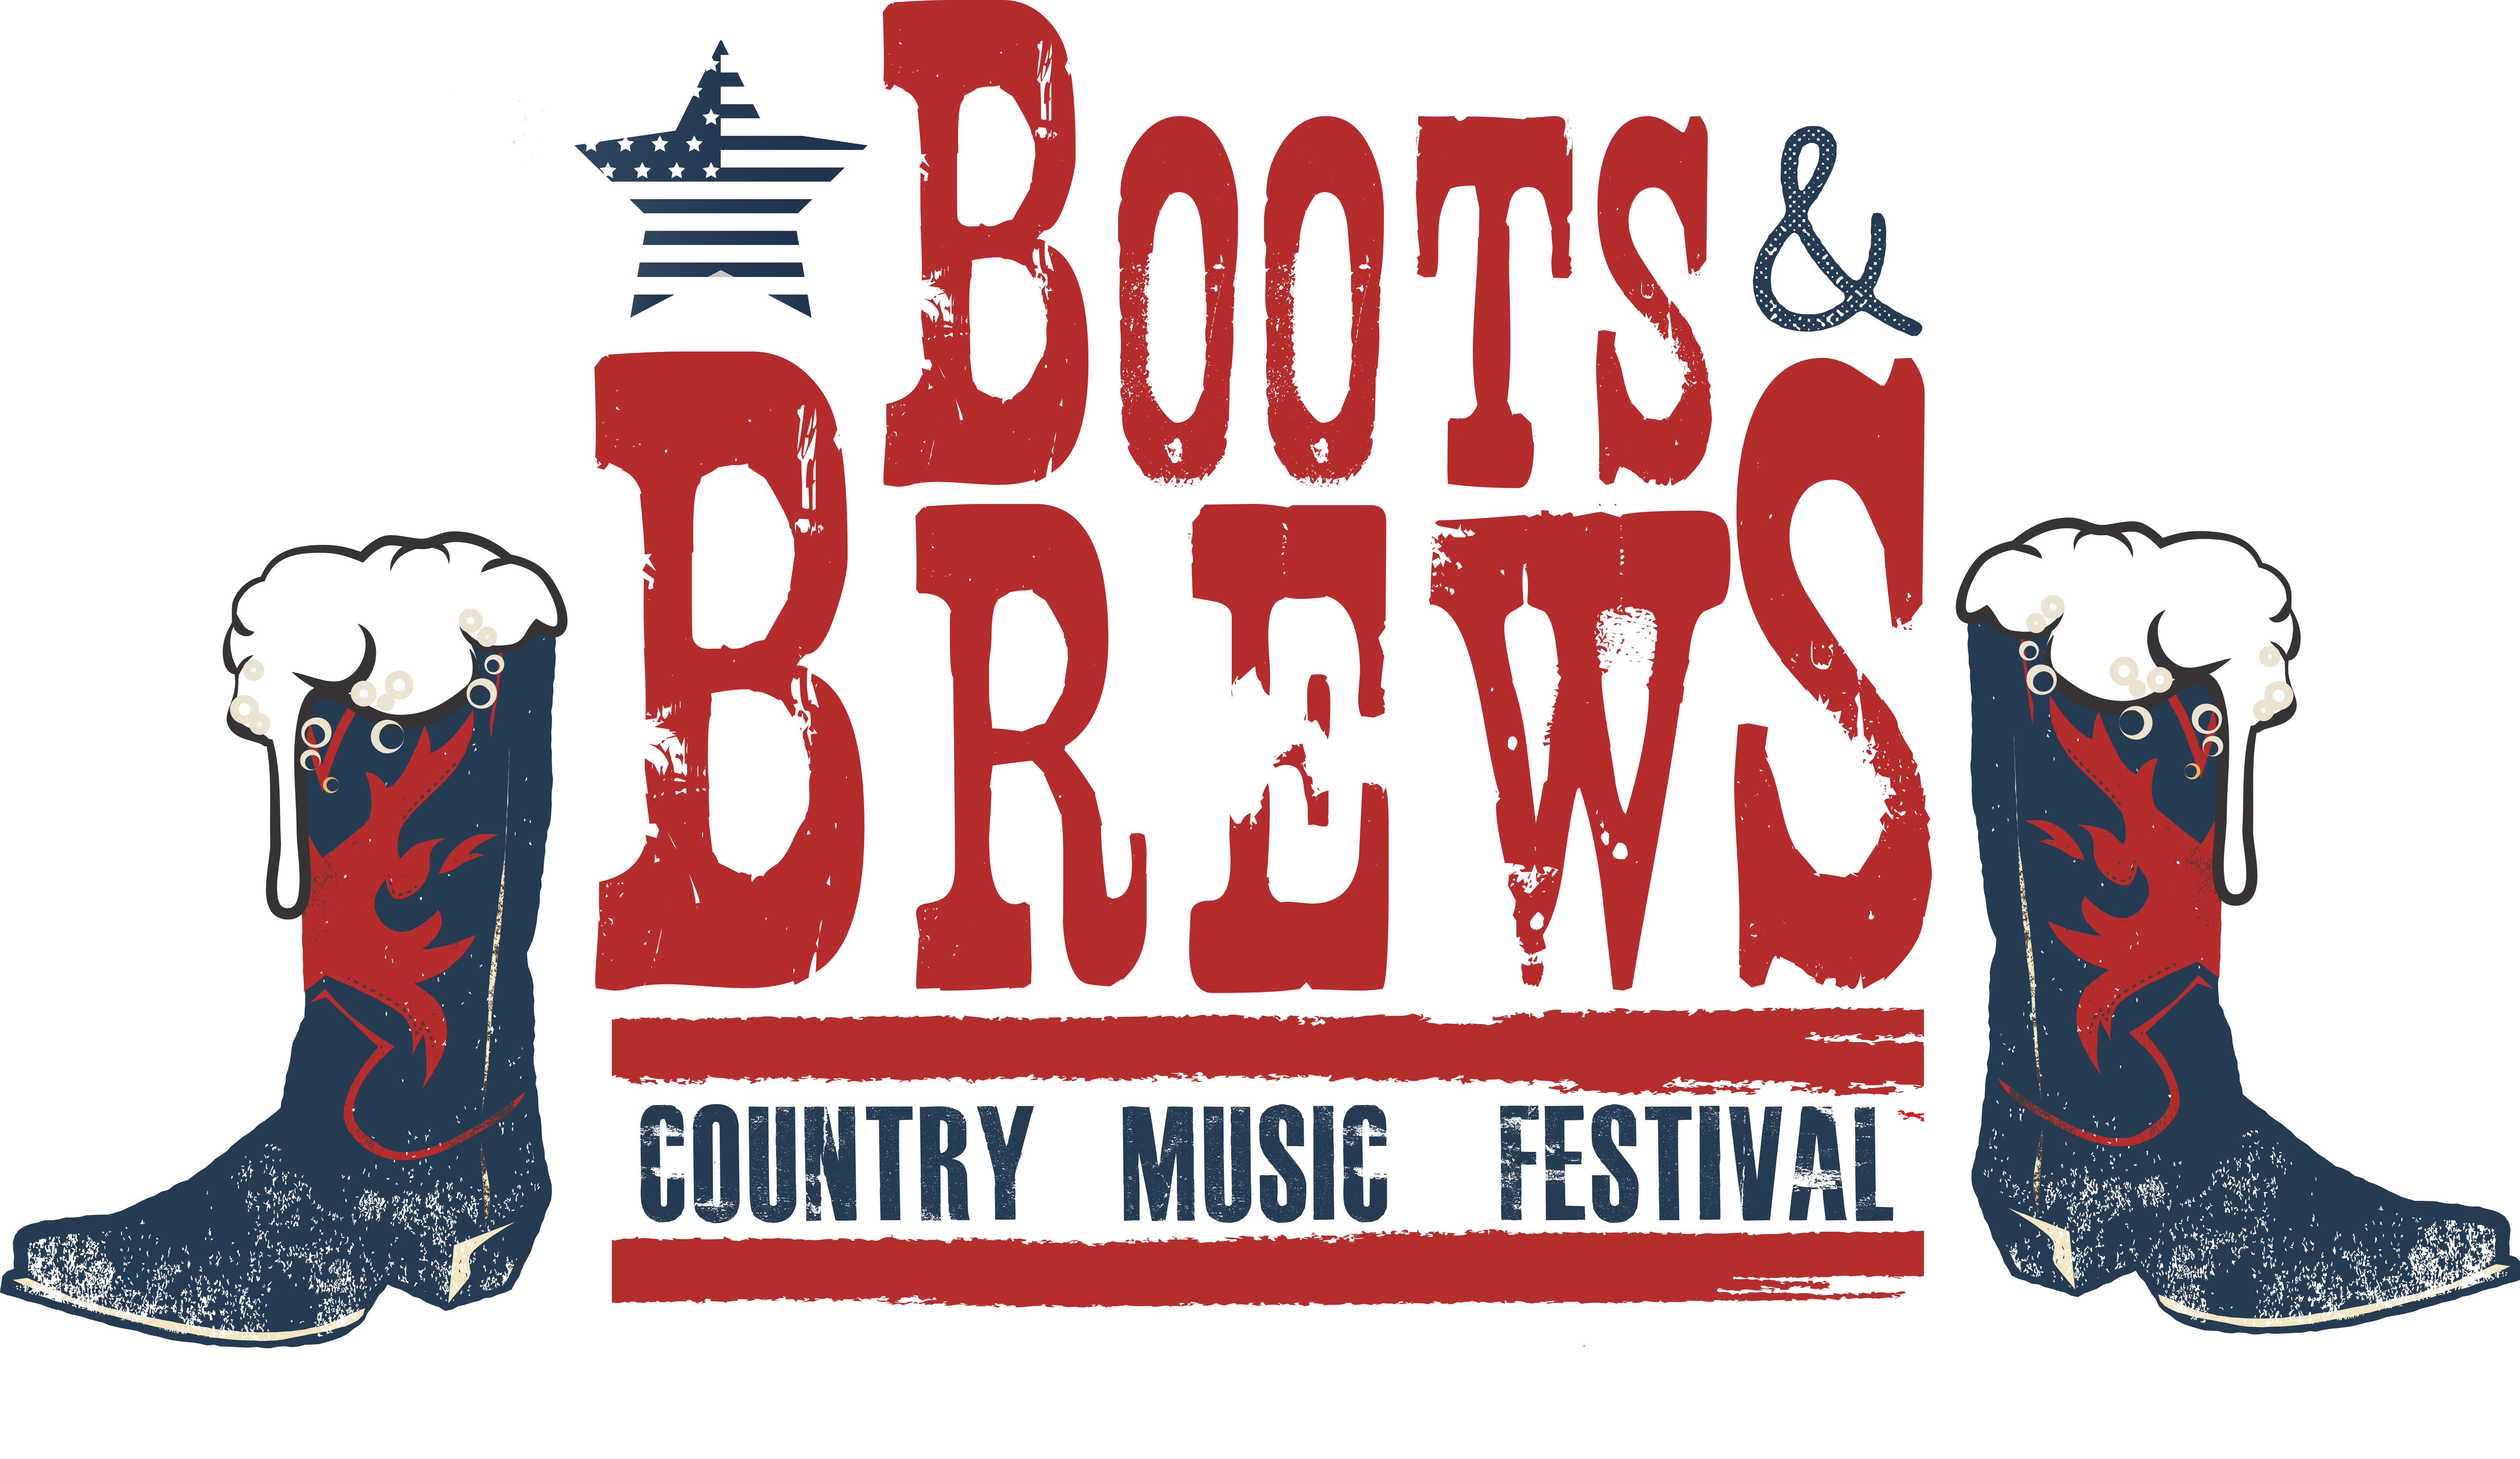 Boots & Brews Country Music Festival Ventura, Santa Clarita